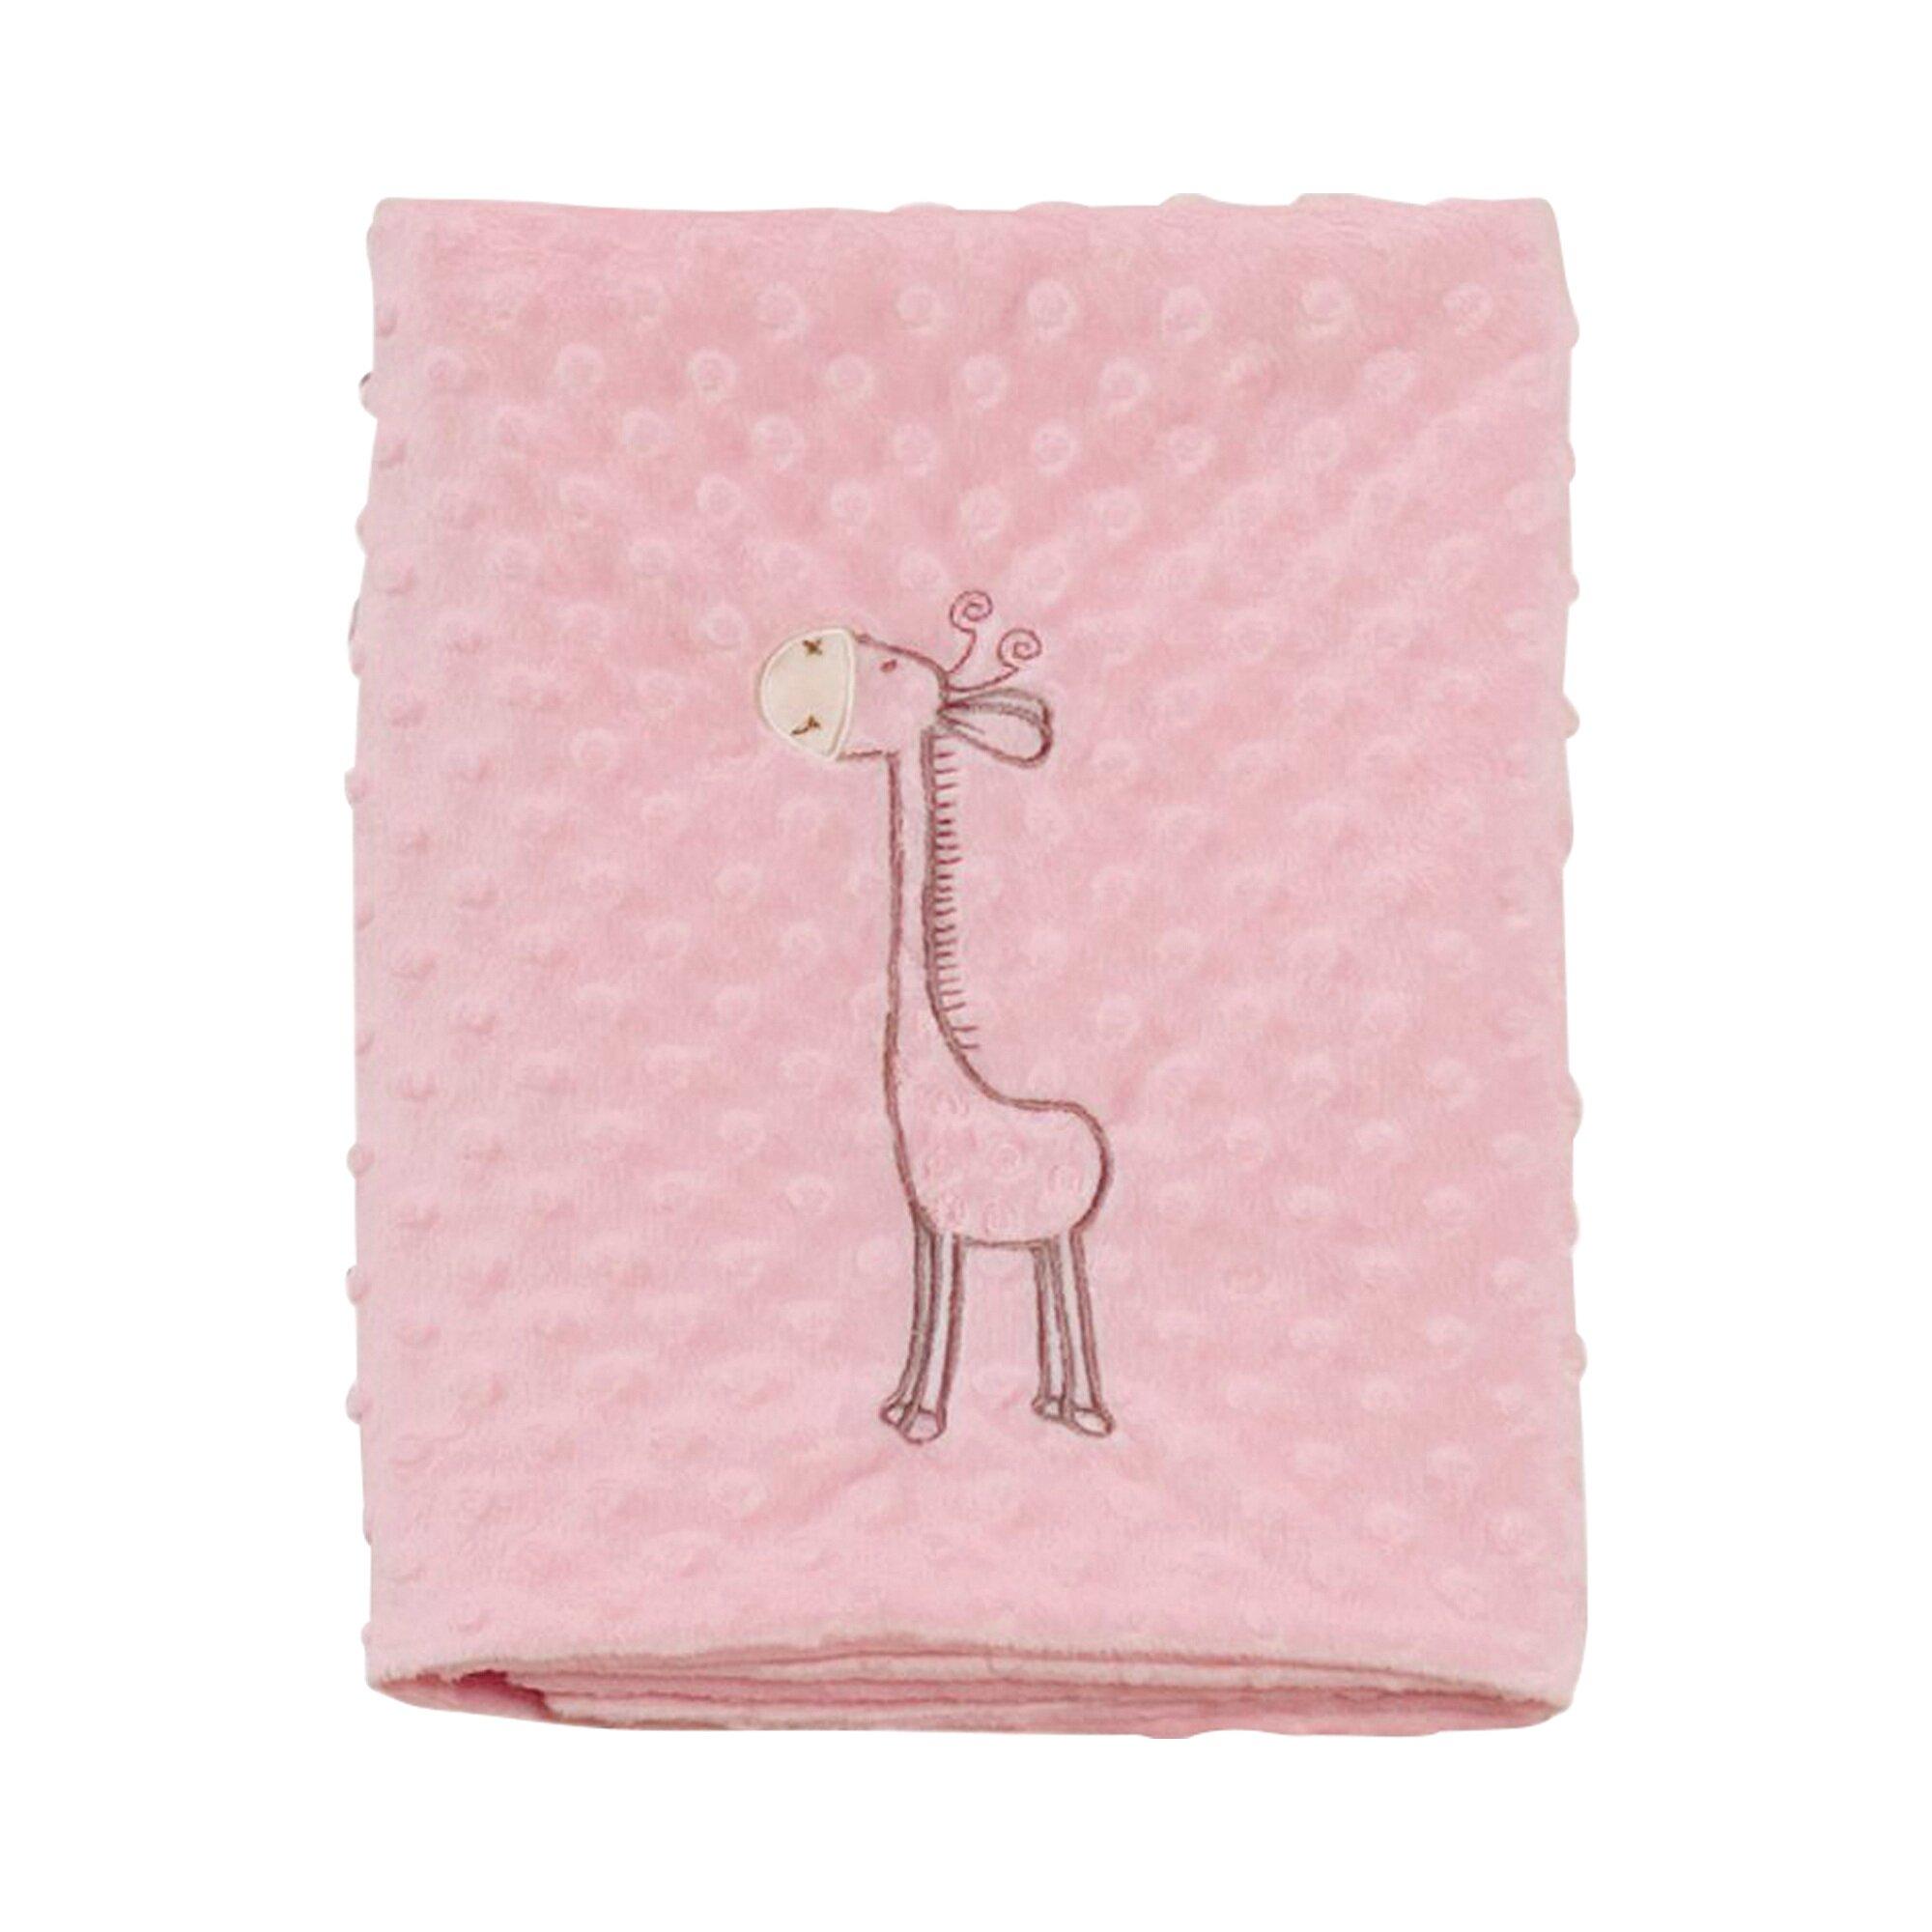 bornino-home-babydecke-giraffe-75x100-cm